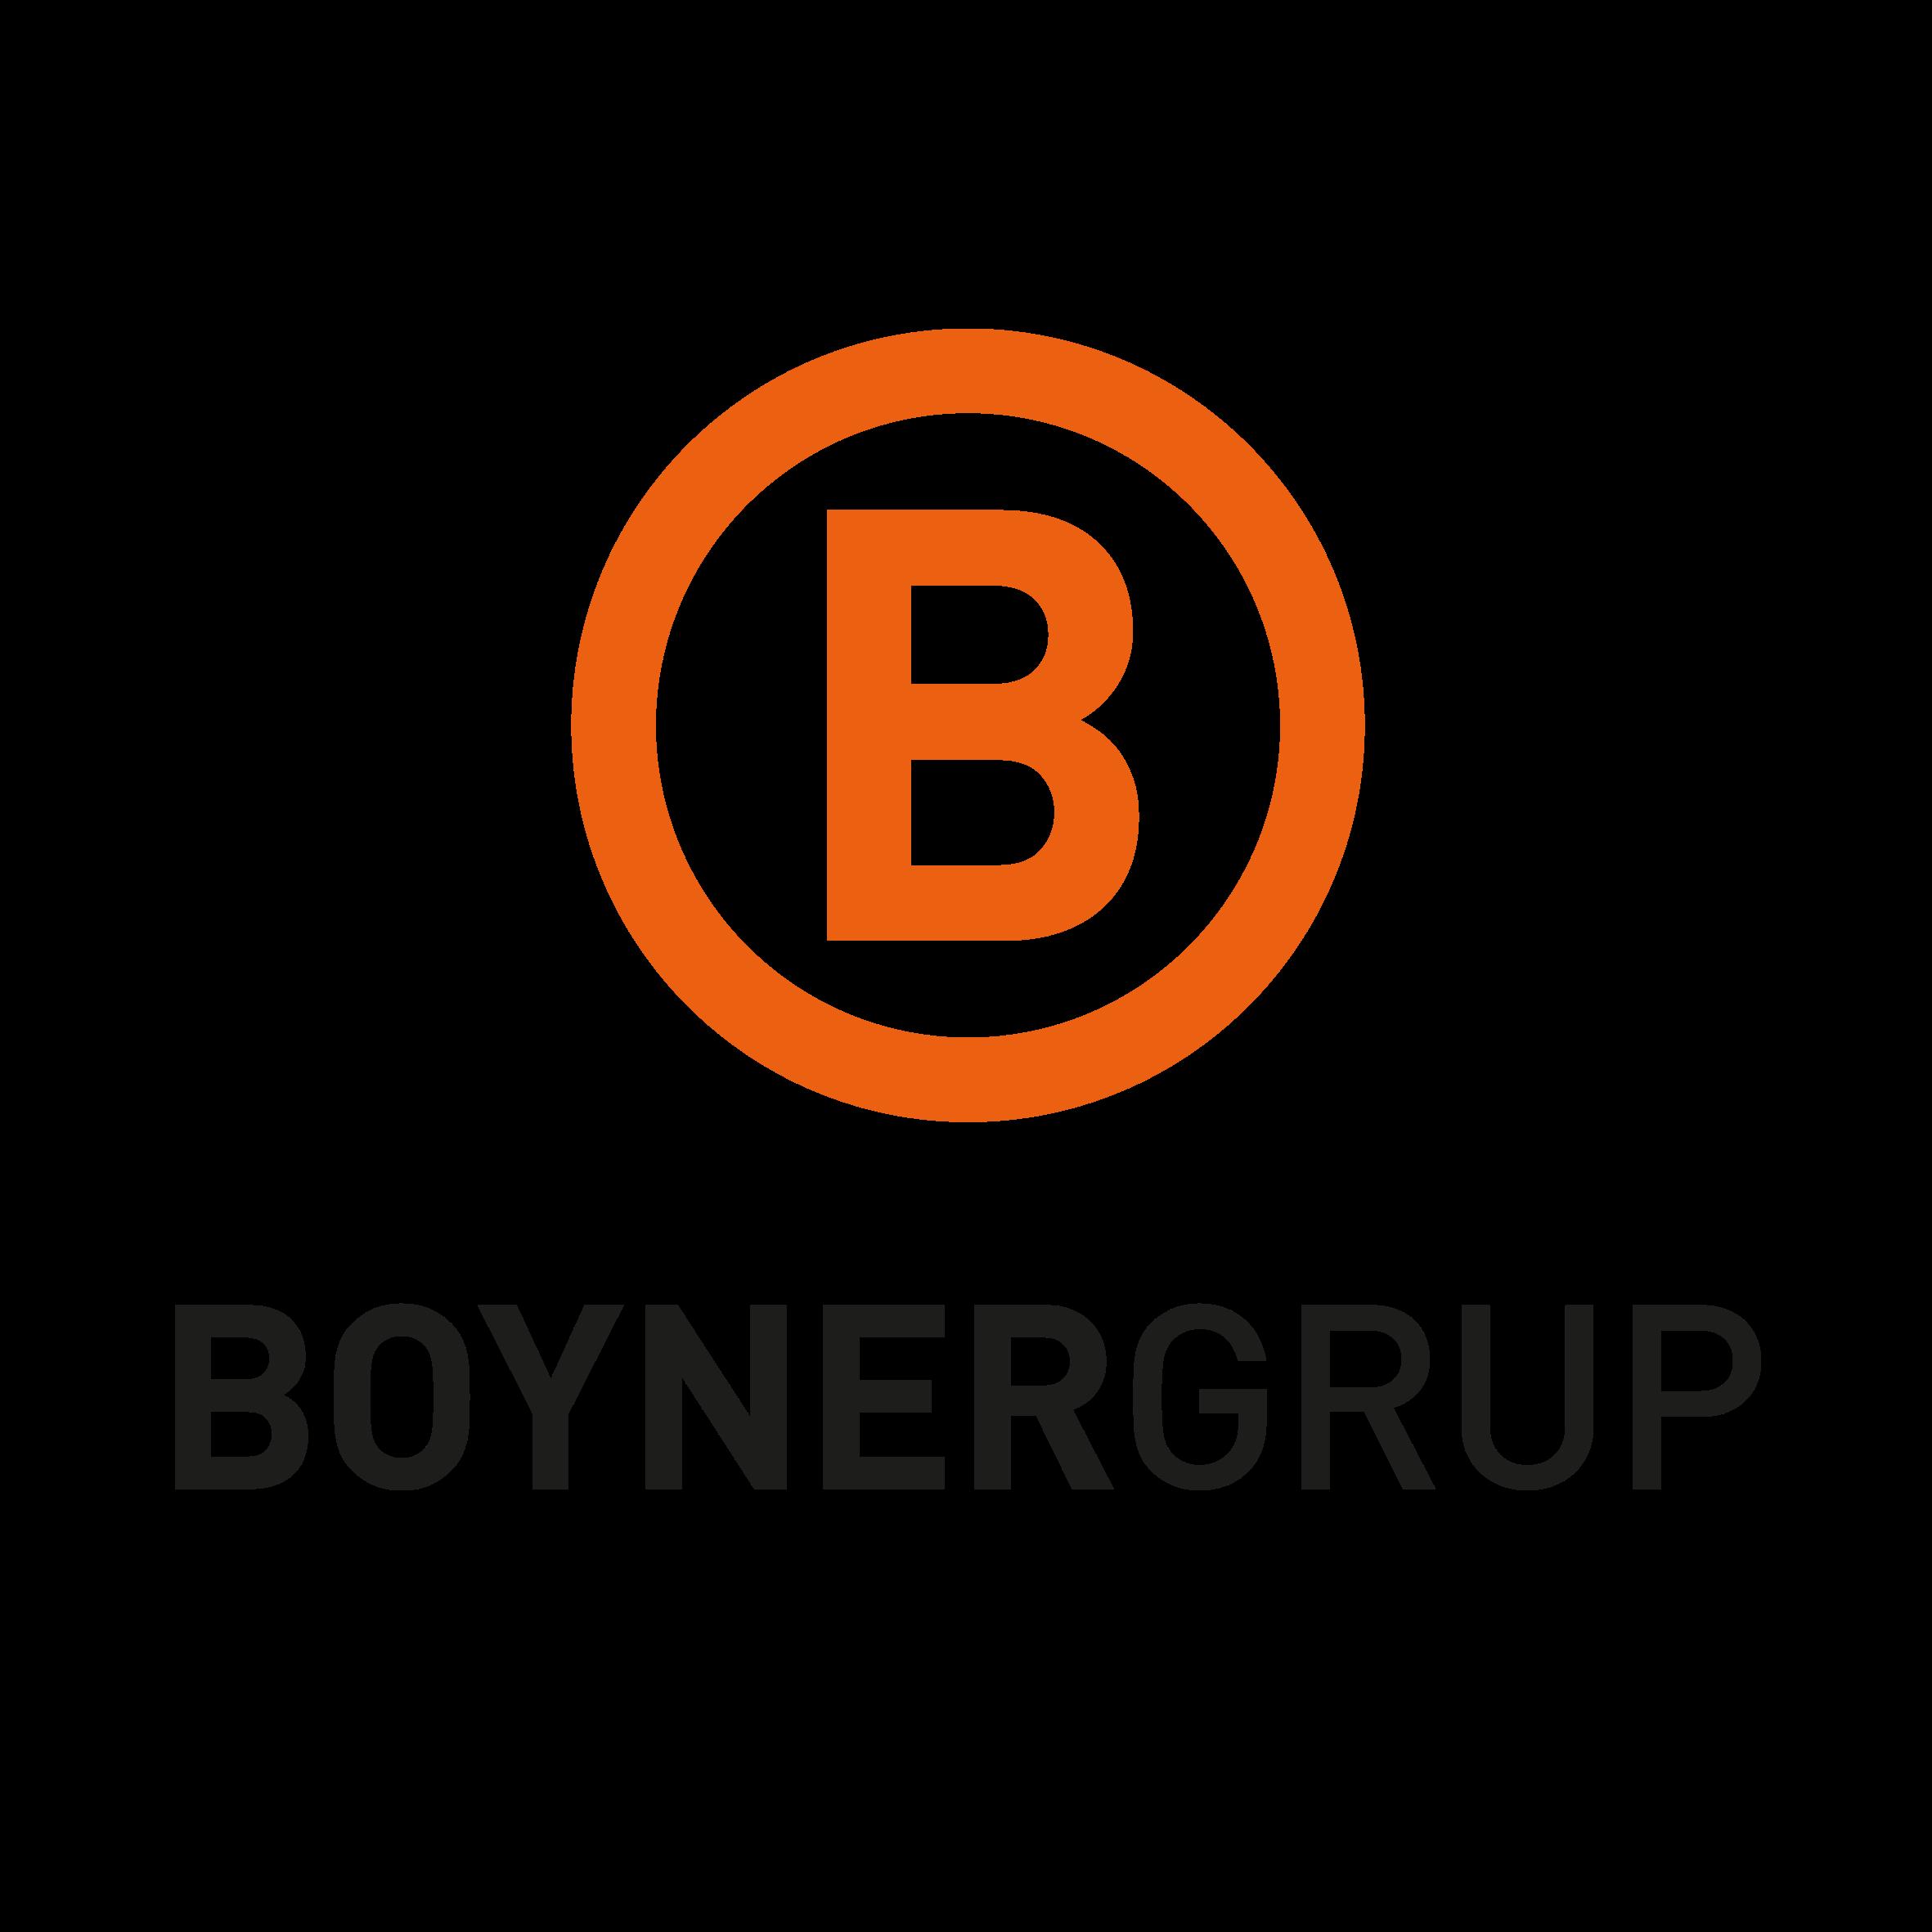 Boyner Group